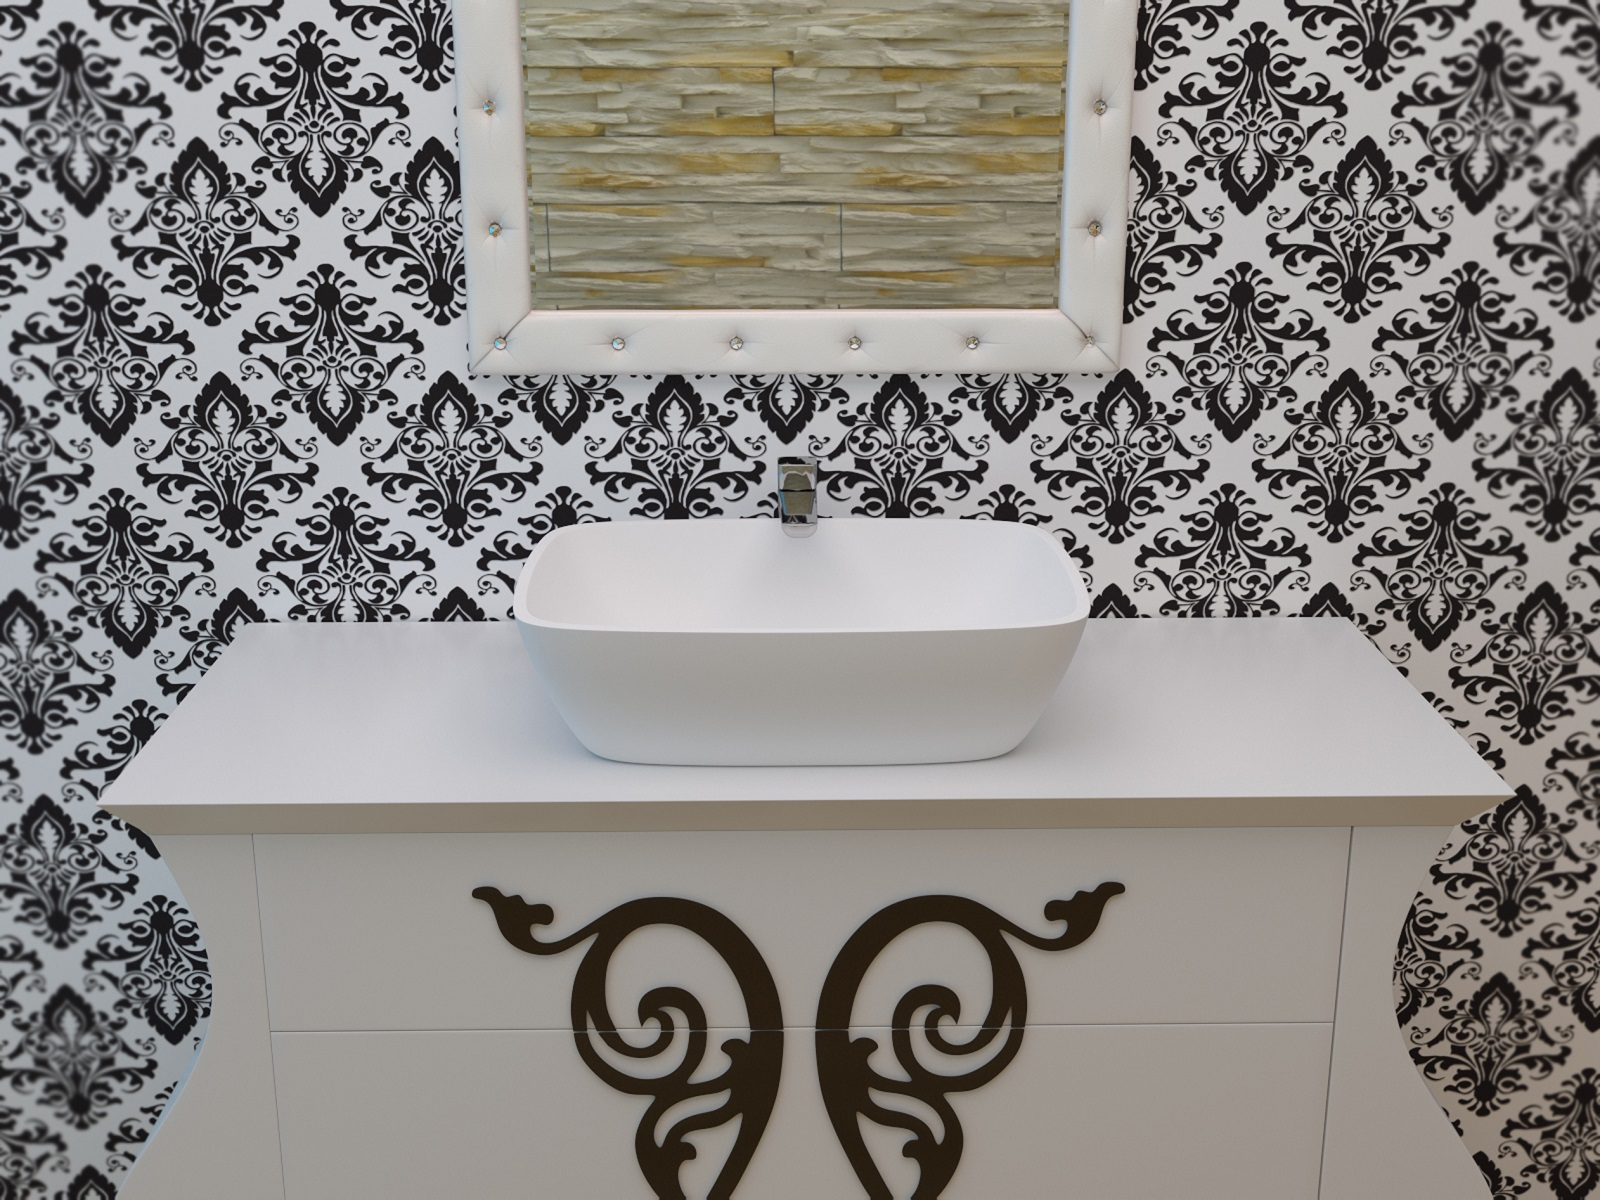 Vier de salle de bain arabella en pierre surface solide for Evier salle de bain en pierre